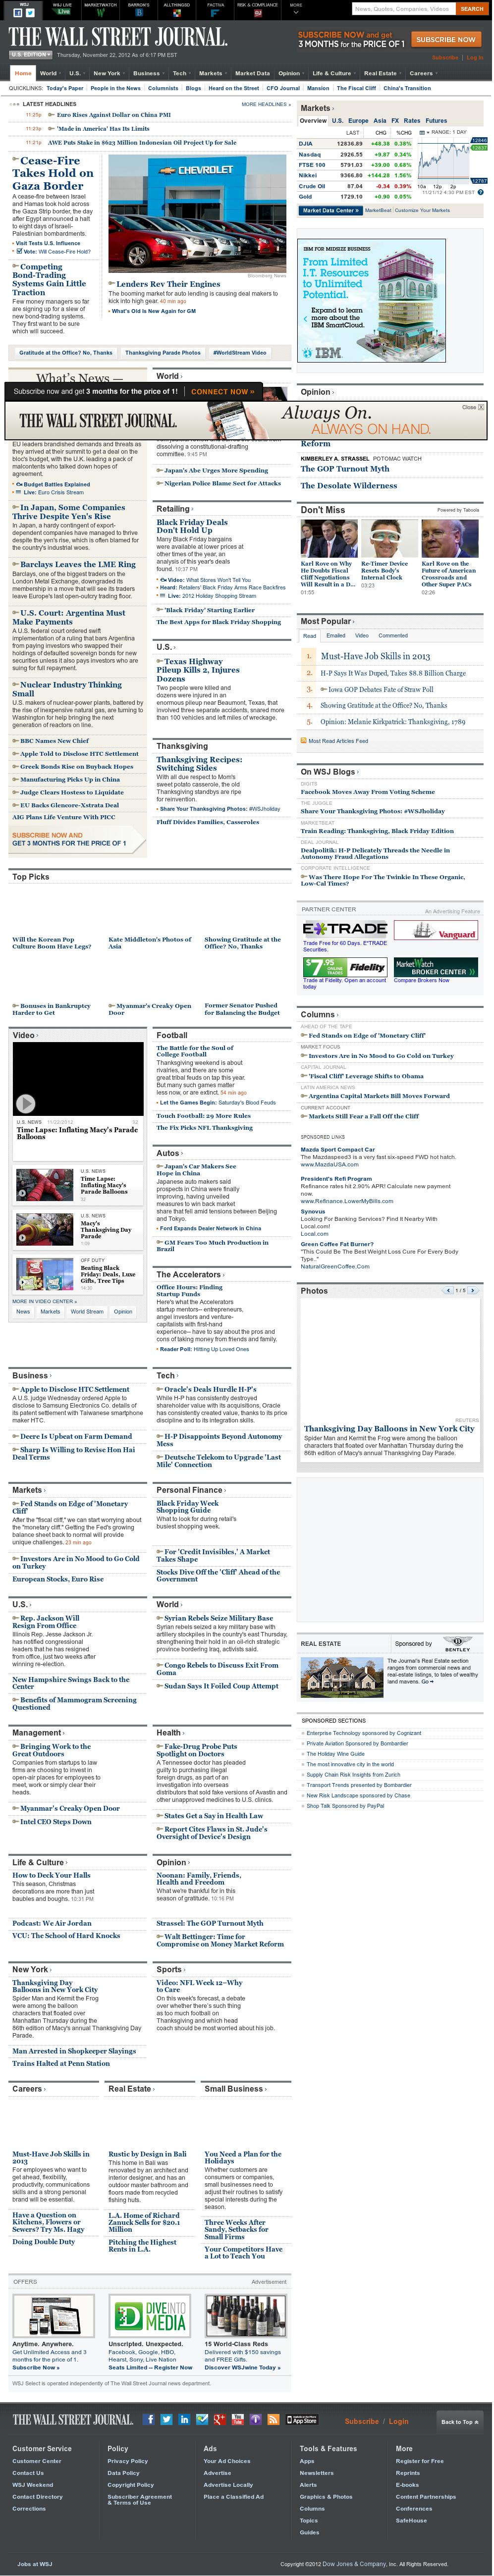 The Wall Street Journal at Thursday Nov. 22, 2012, 11:37 p.m. UTC